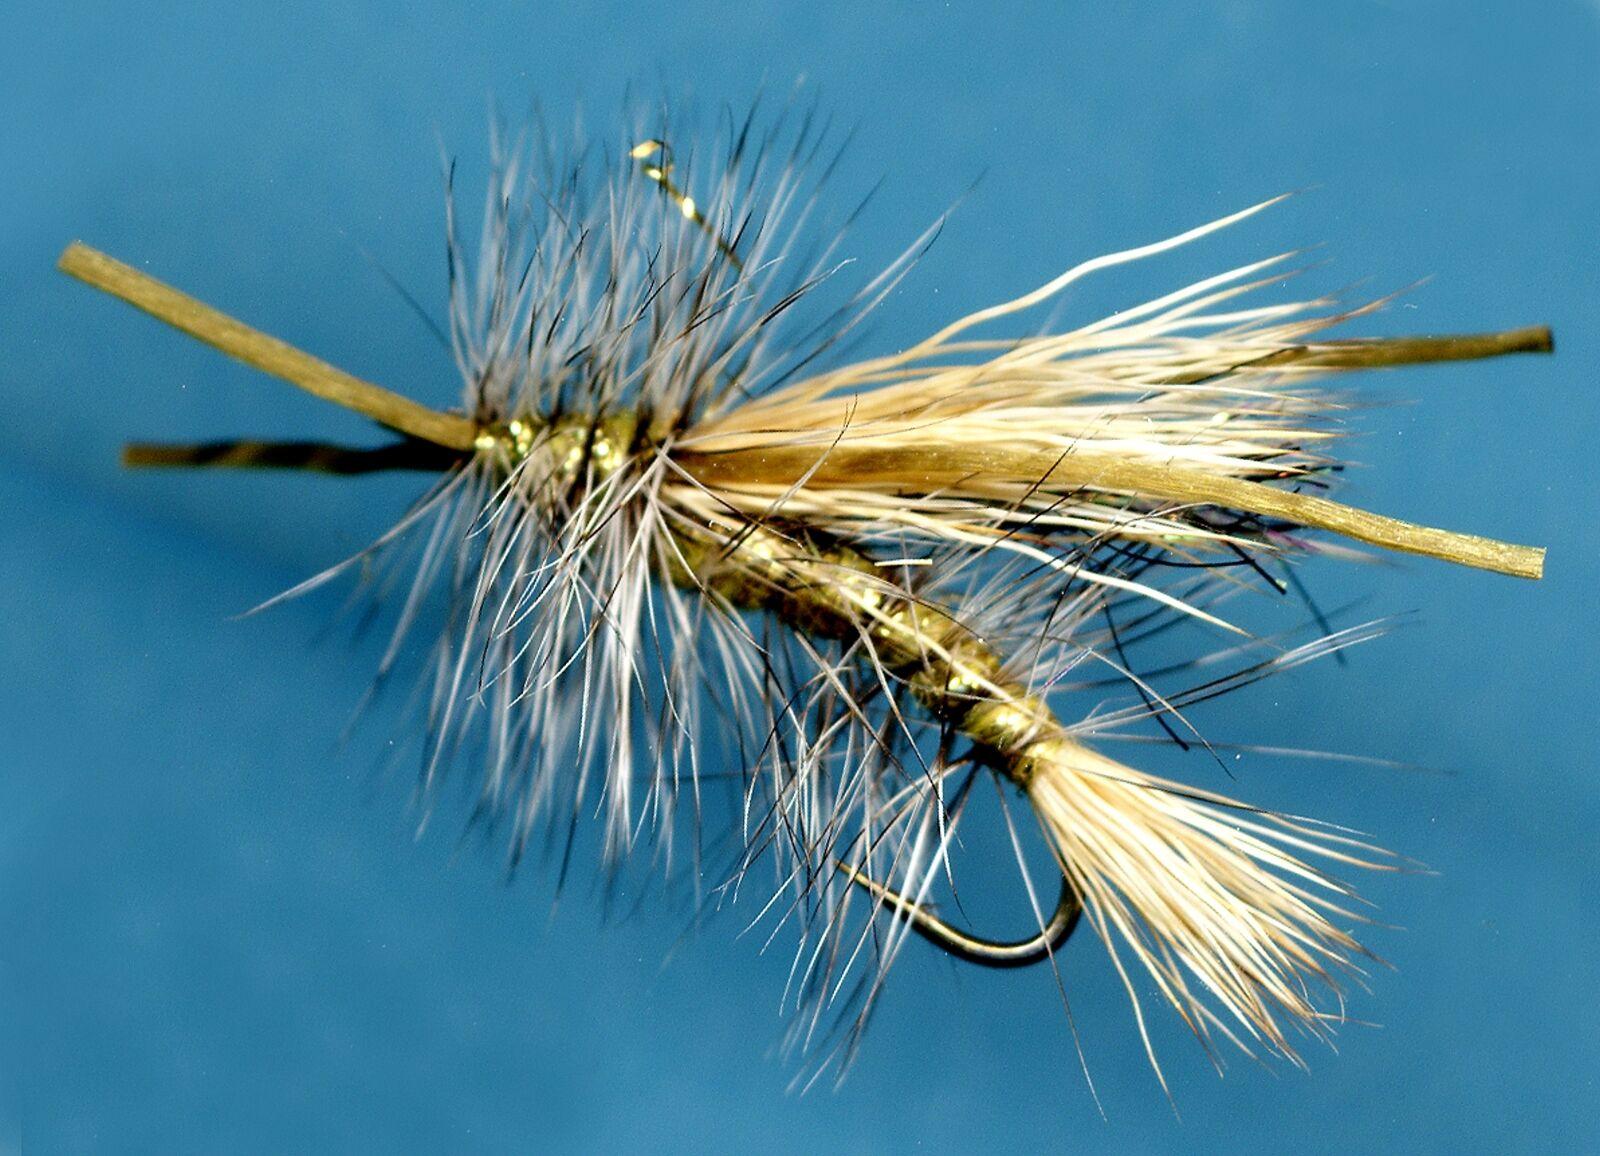 fly fishing flies - HD1600×1156